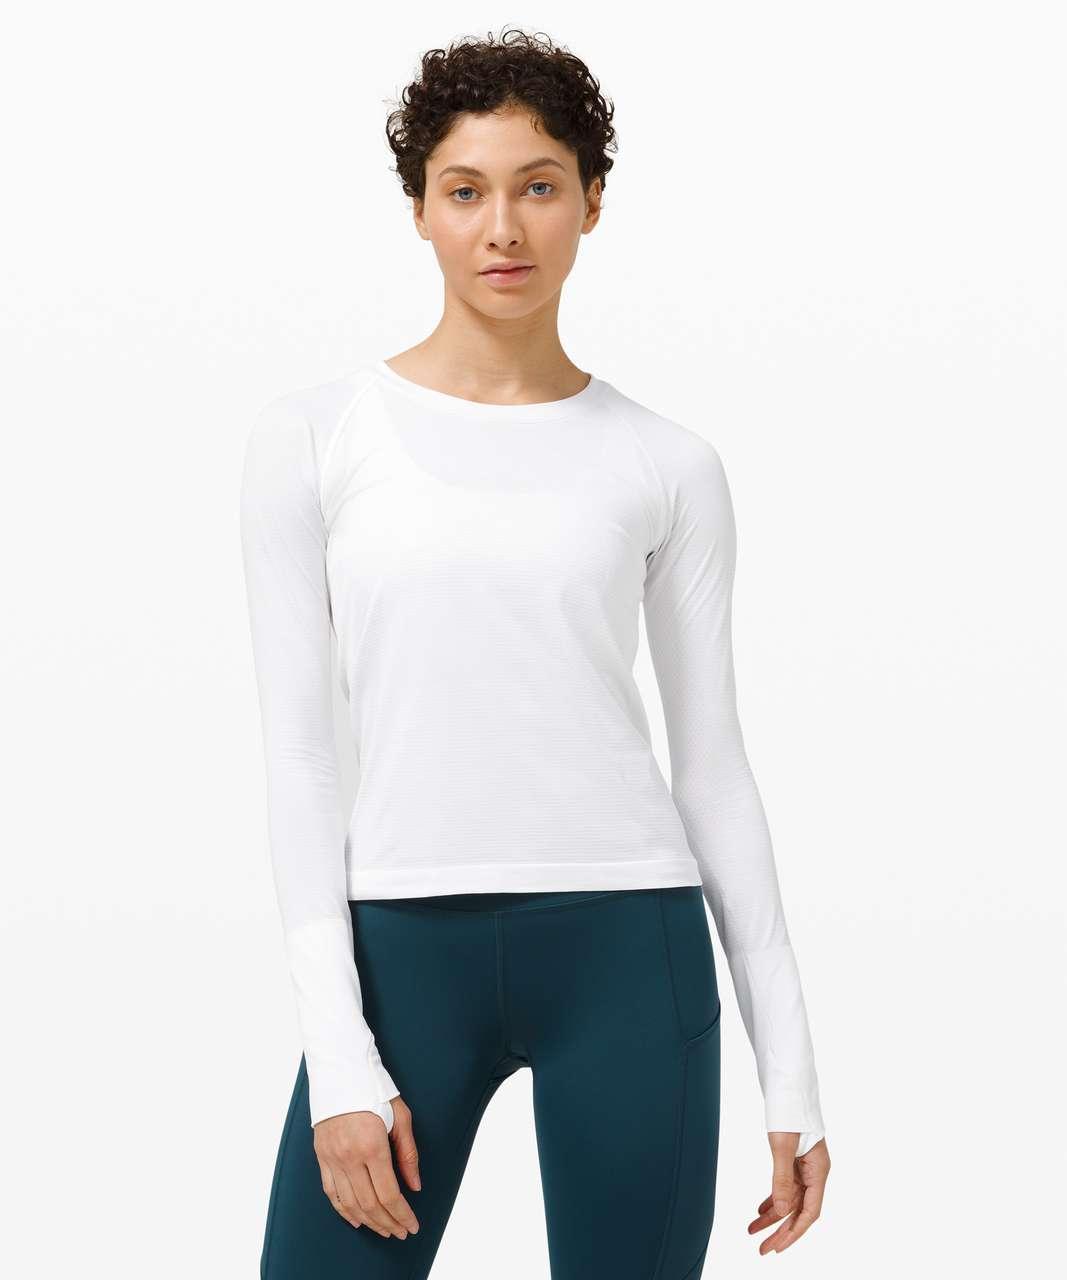 Lululemon Swiftly Tech Long Sleeve 2.0 *Race Length - White / White